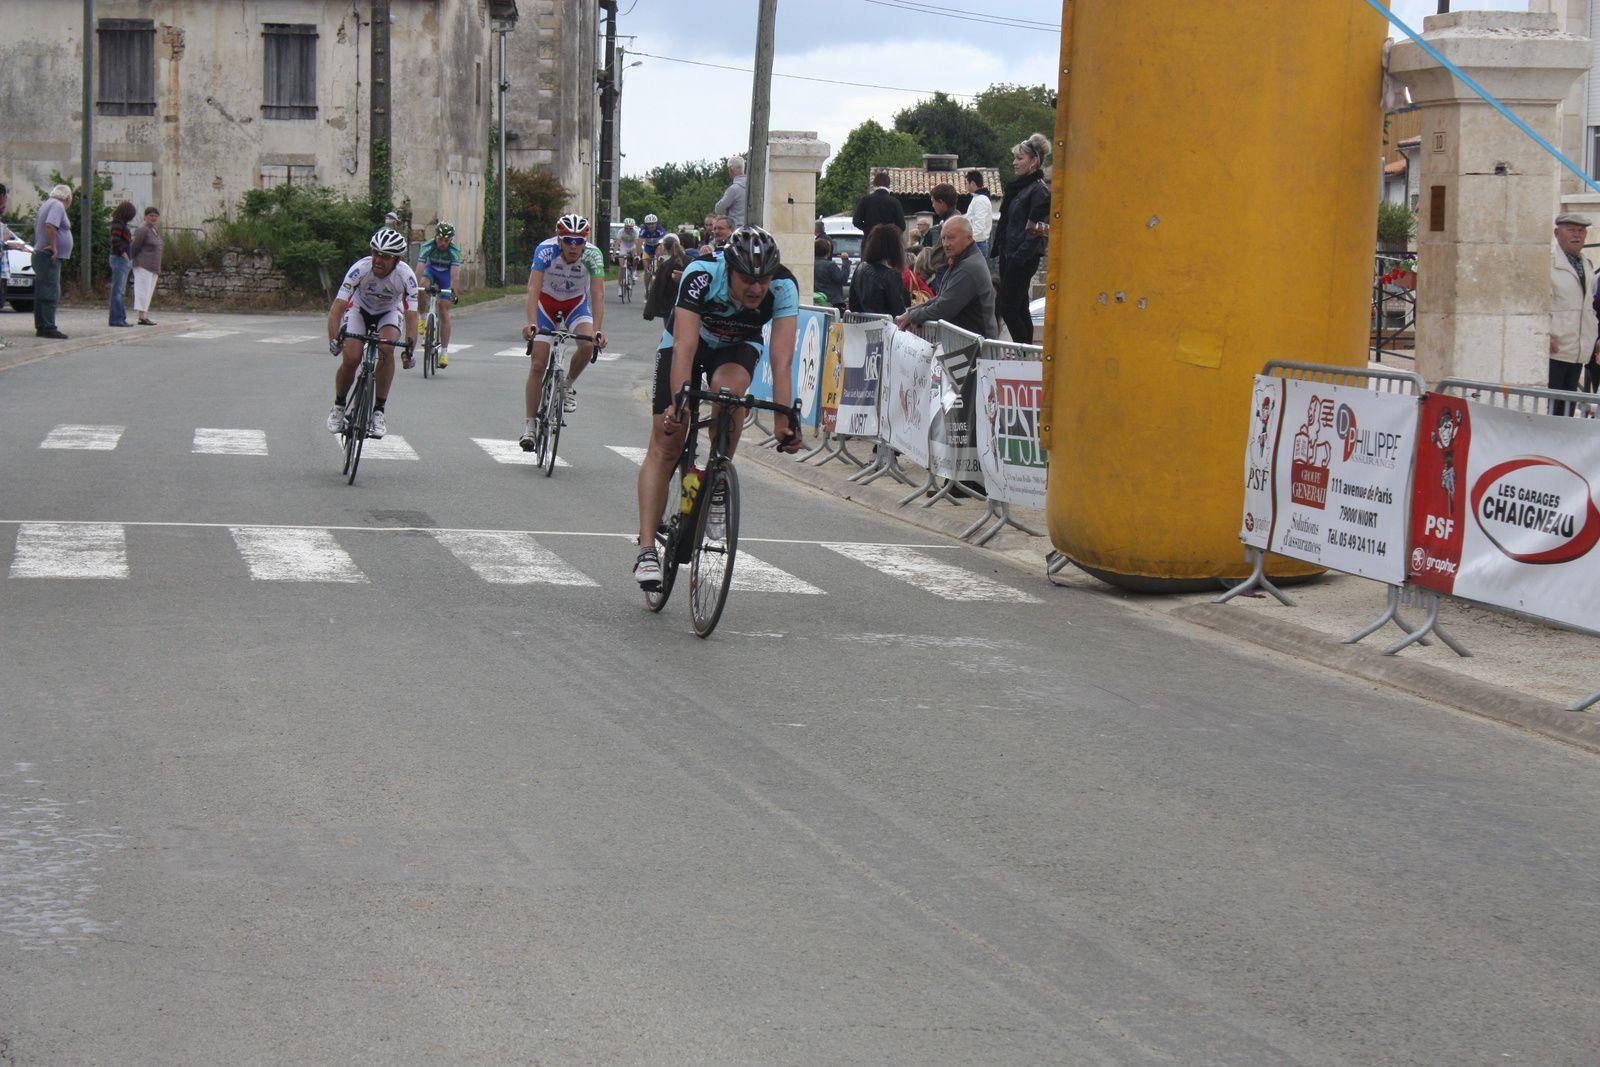 13e  Ludovic  LAVAUD (JS  St  Astier), 14e  Philippe  BEAUDOIN (VC  Loudun), 15e  Philippe  HERVE(VC  Chatillon), 16e  Clément  GARCIA(Les  Bleus  de  France), 17e  Francis  FEMANDY (AC  Jarnac-Aigre-Rouillac),18e  Louis  LAPIERRE  (C  Poitevin), 19e  Florian  SARRAGOT (VC  Saintes), 20e   Sébastien  SUBRA(CC  Vervant),  22e  Grégory  GAILLARD(UVA), 24e  Luc  SOENEN(VCCO), 27e  Philippe  ESCOUBET(T  Grinta)